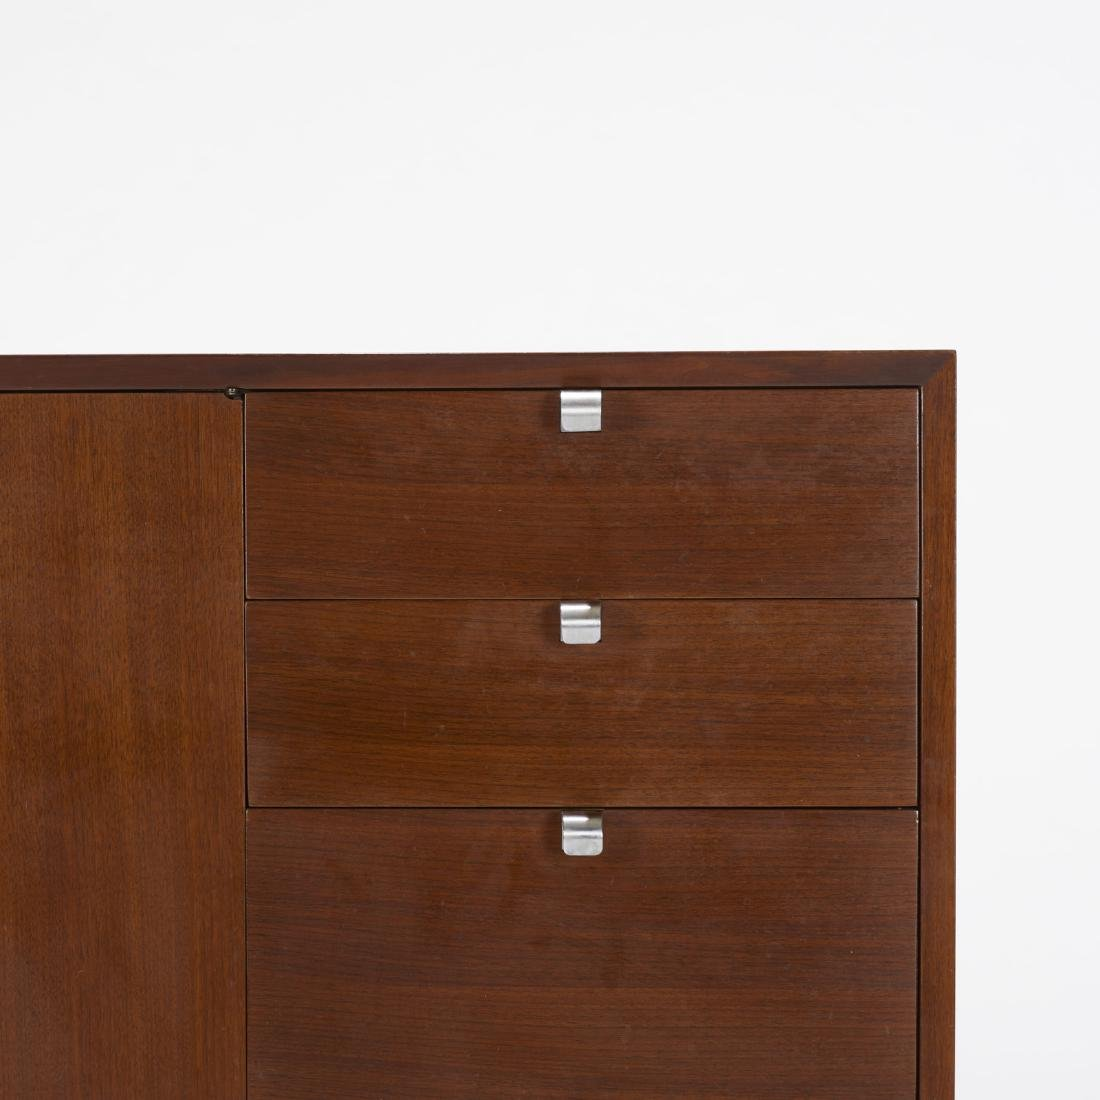 George Nelson & Associates, cabinet, model 4937 - 3